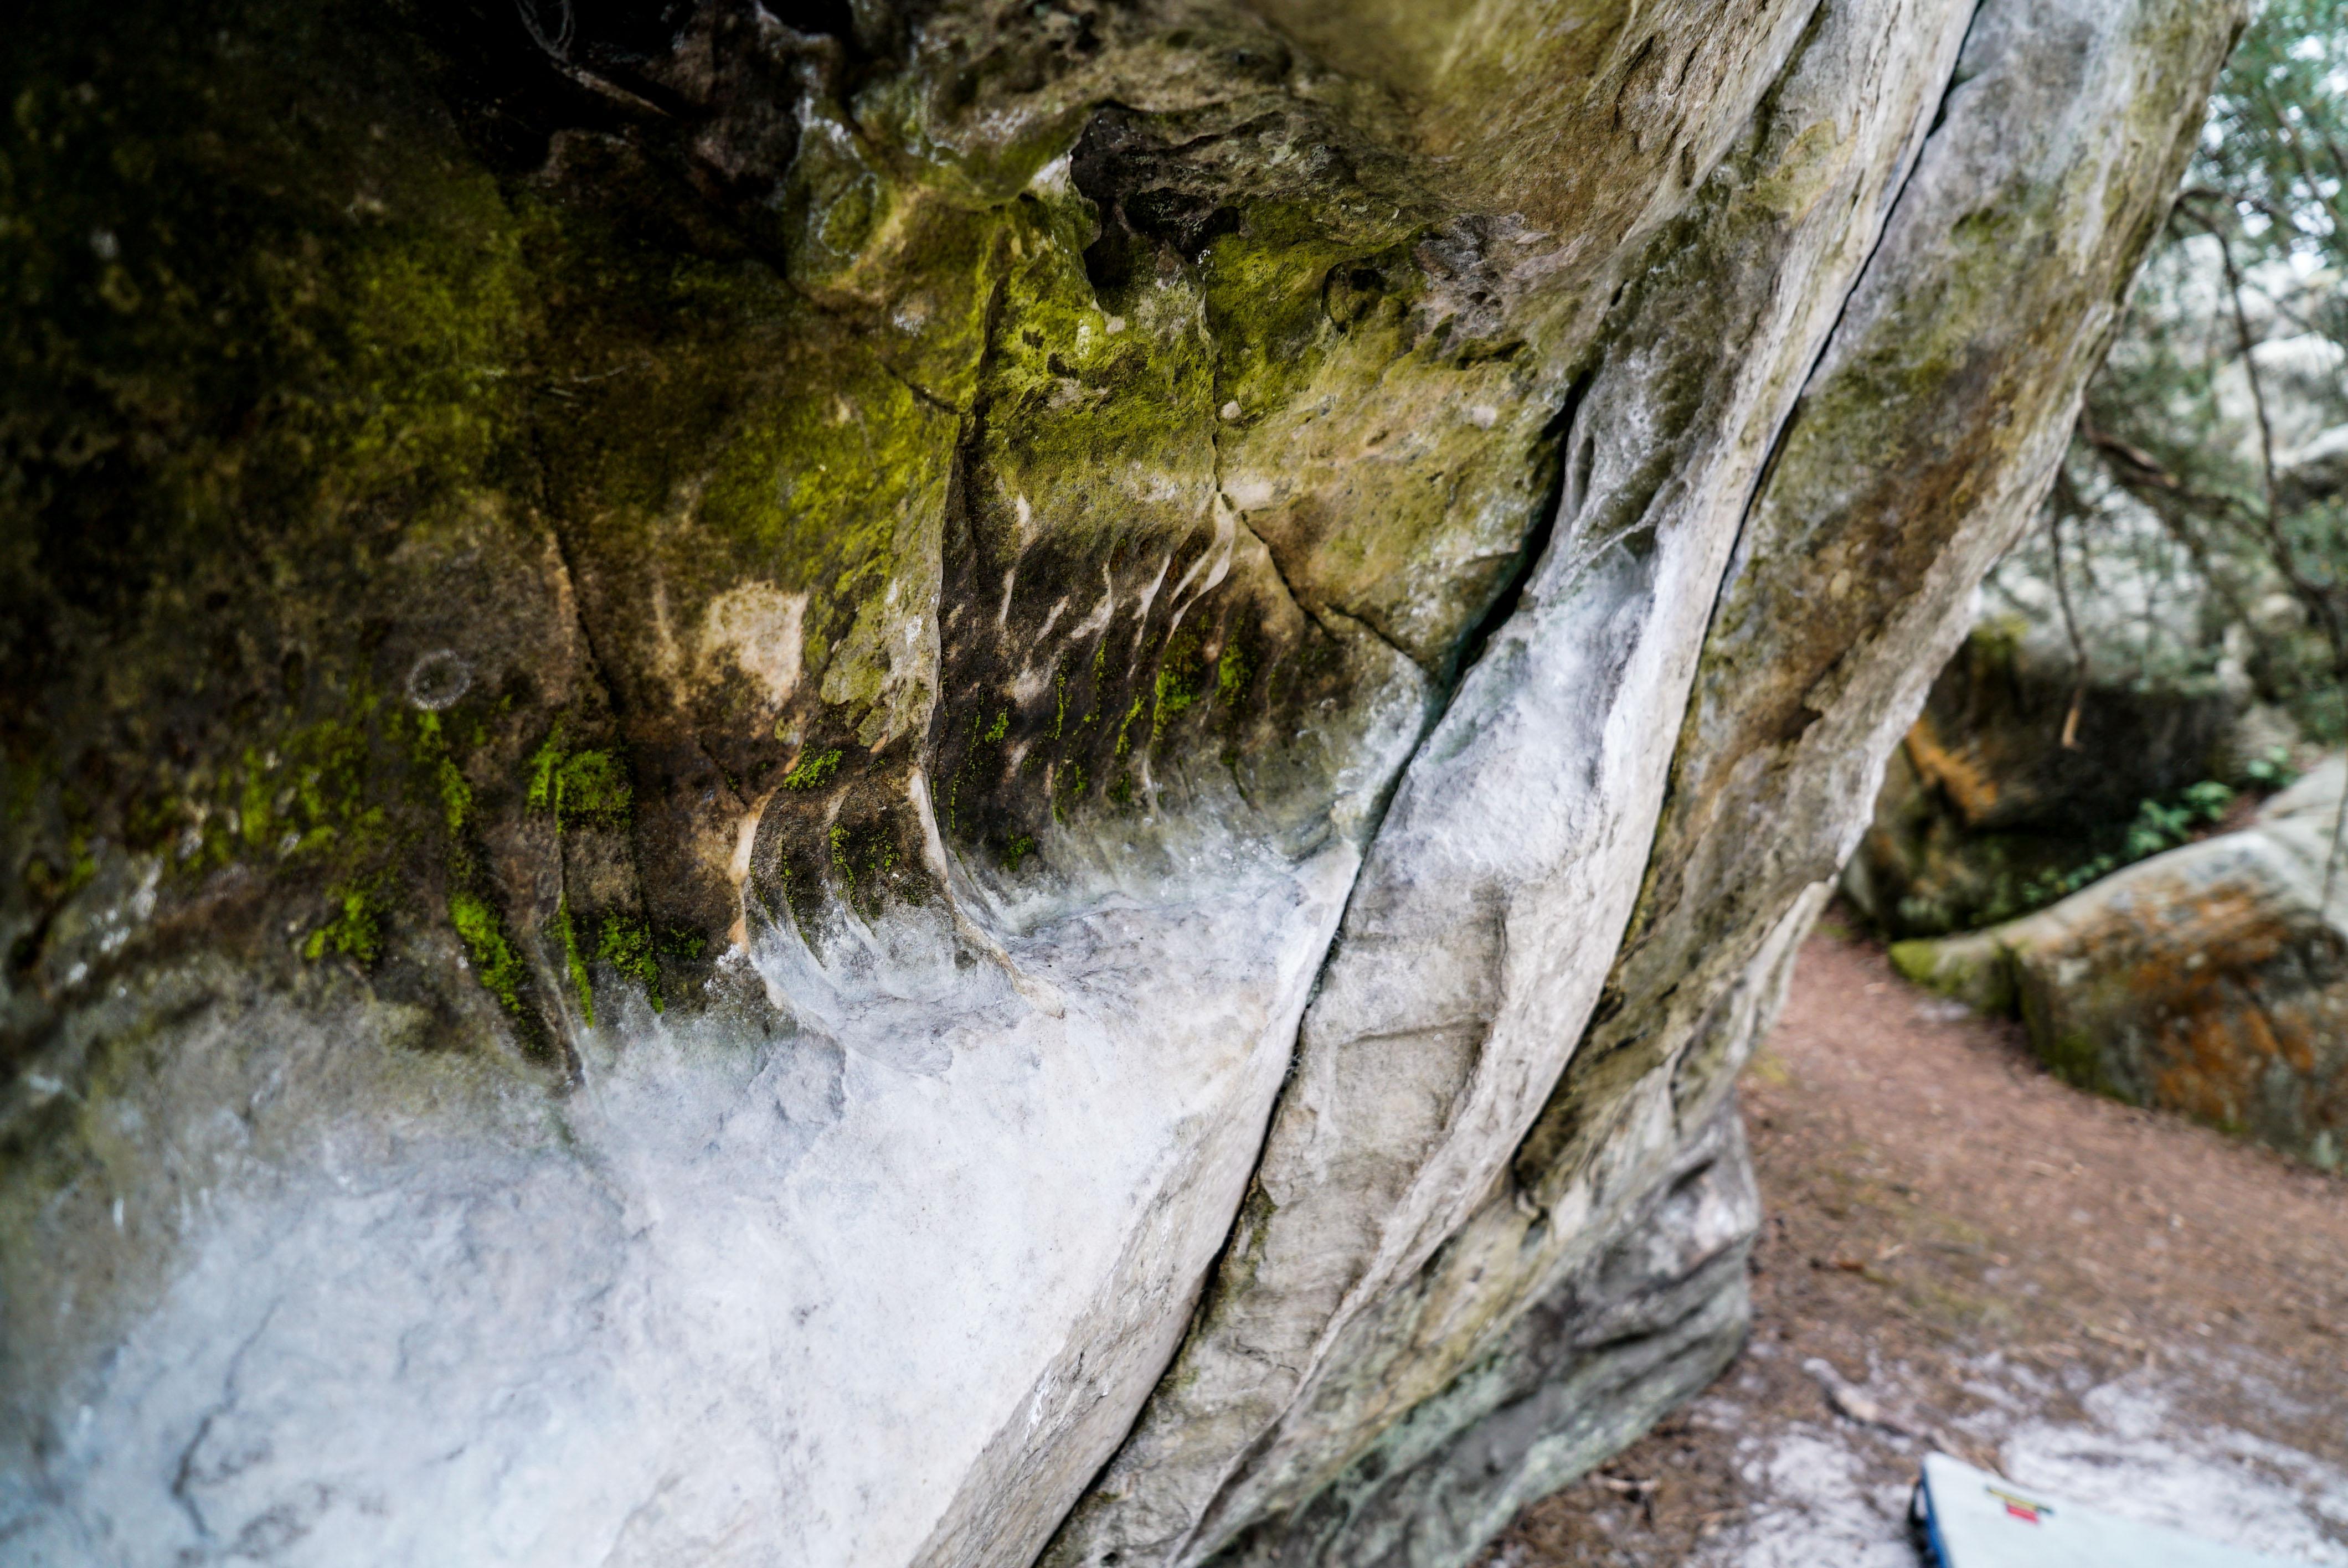 fontainbleau climbing 2016 mike brindley-4